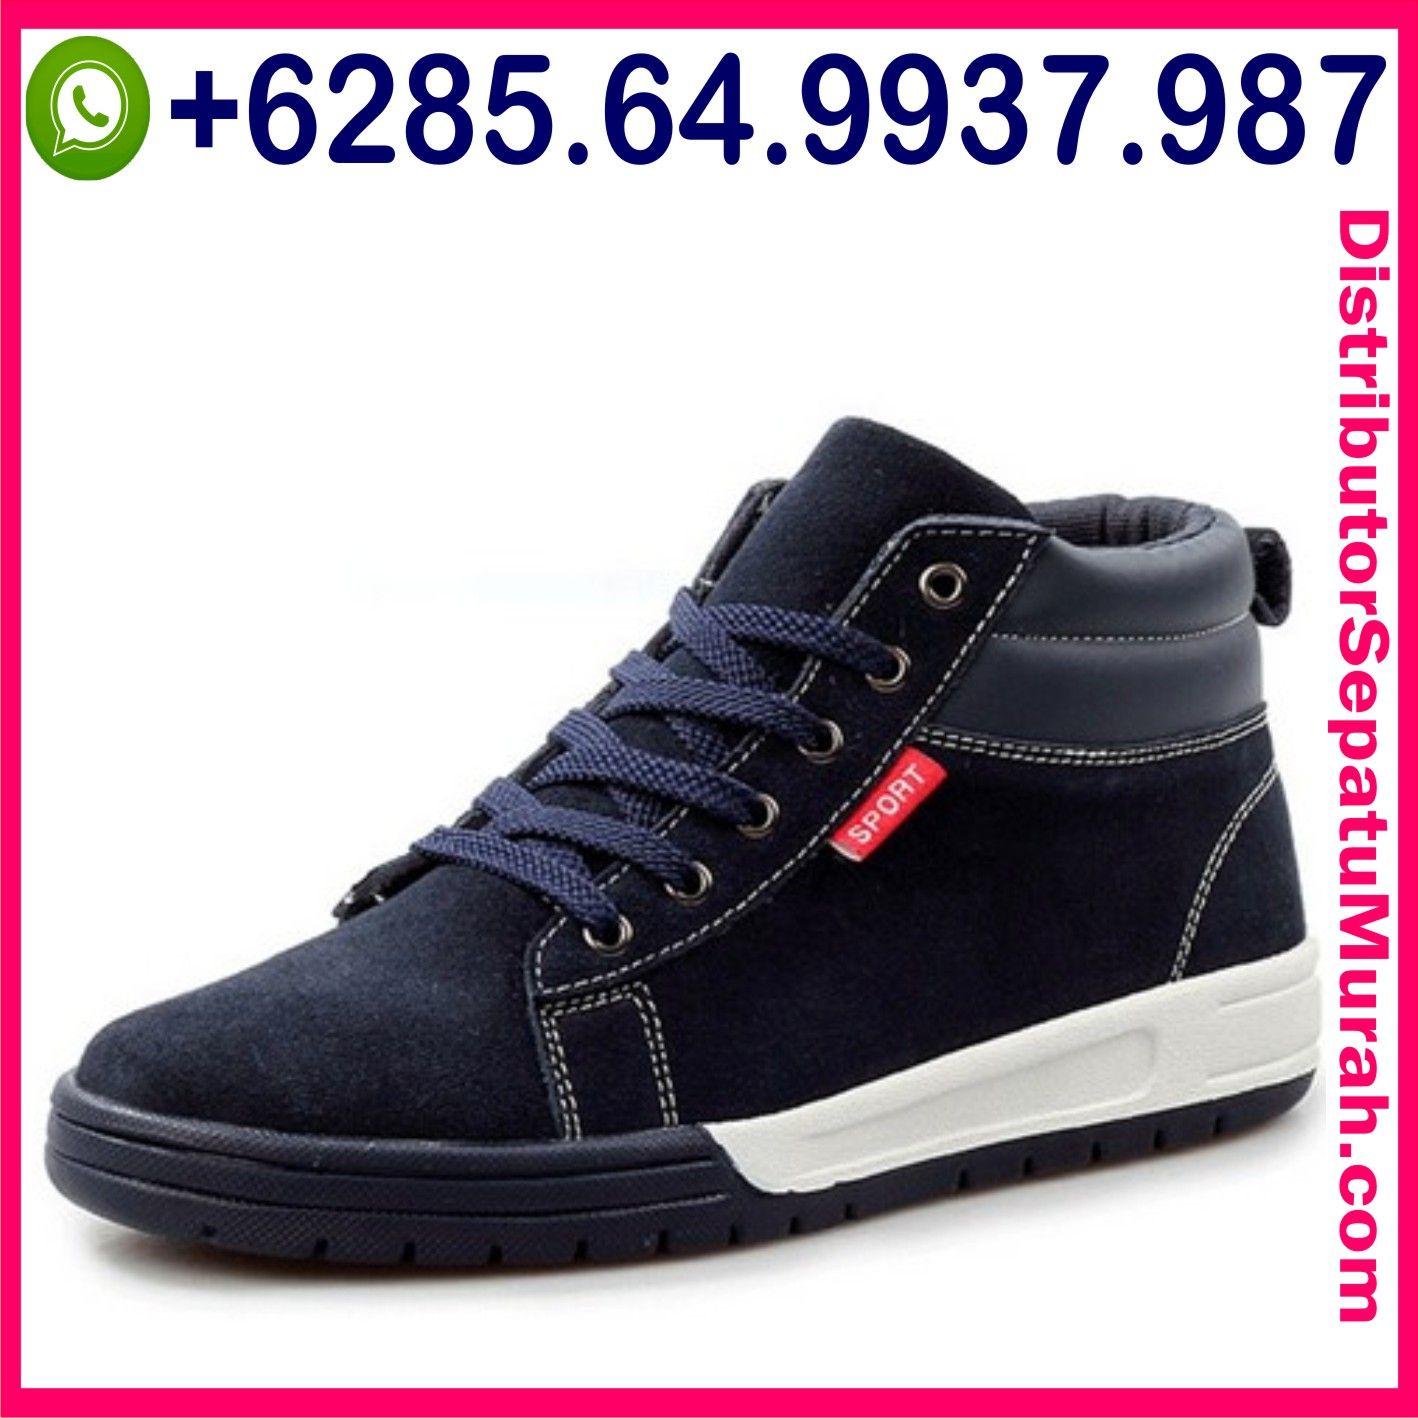 Sepatu Pria Sepatu Pria Sepatu Sepatu Anak